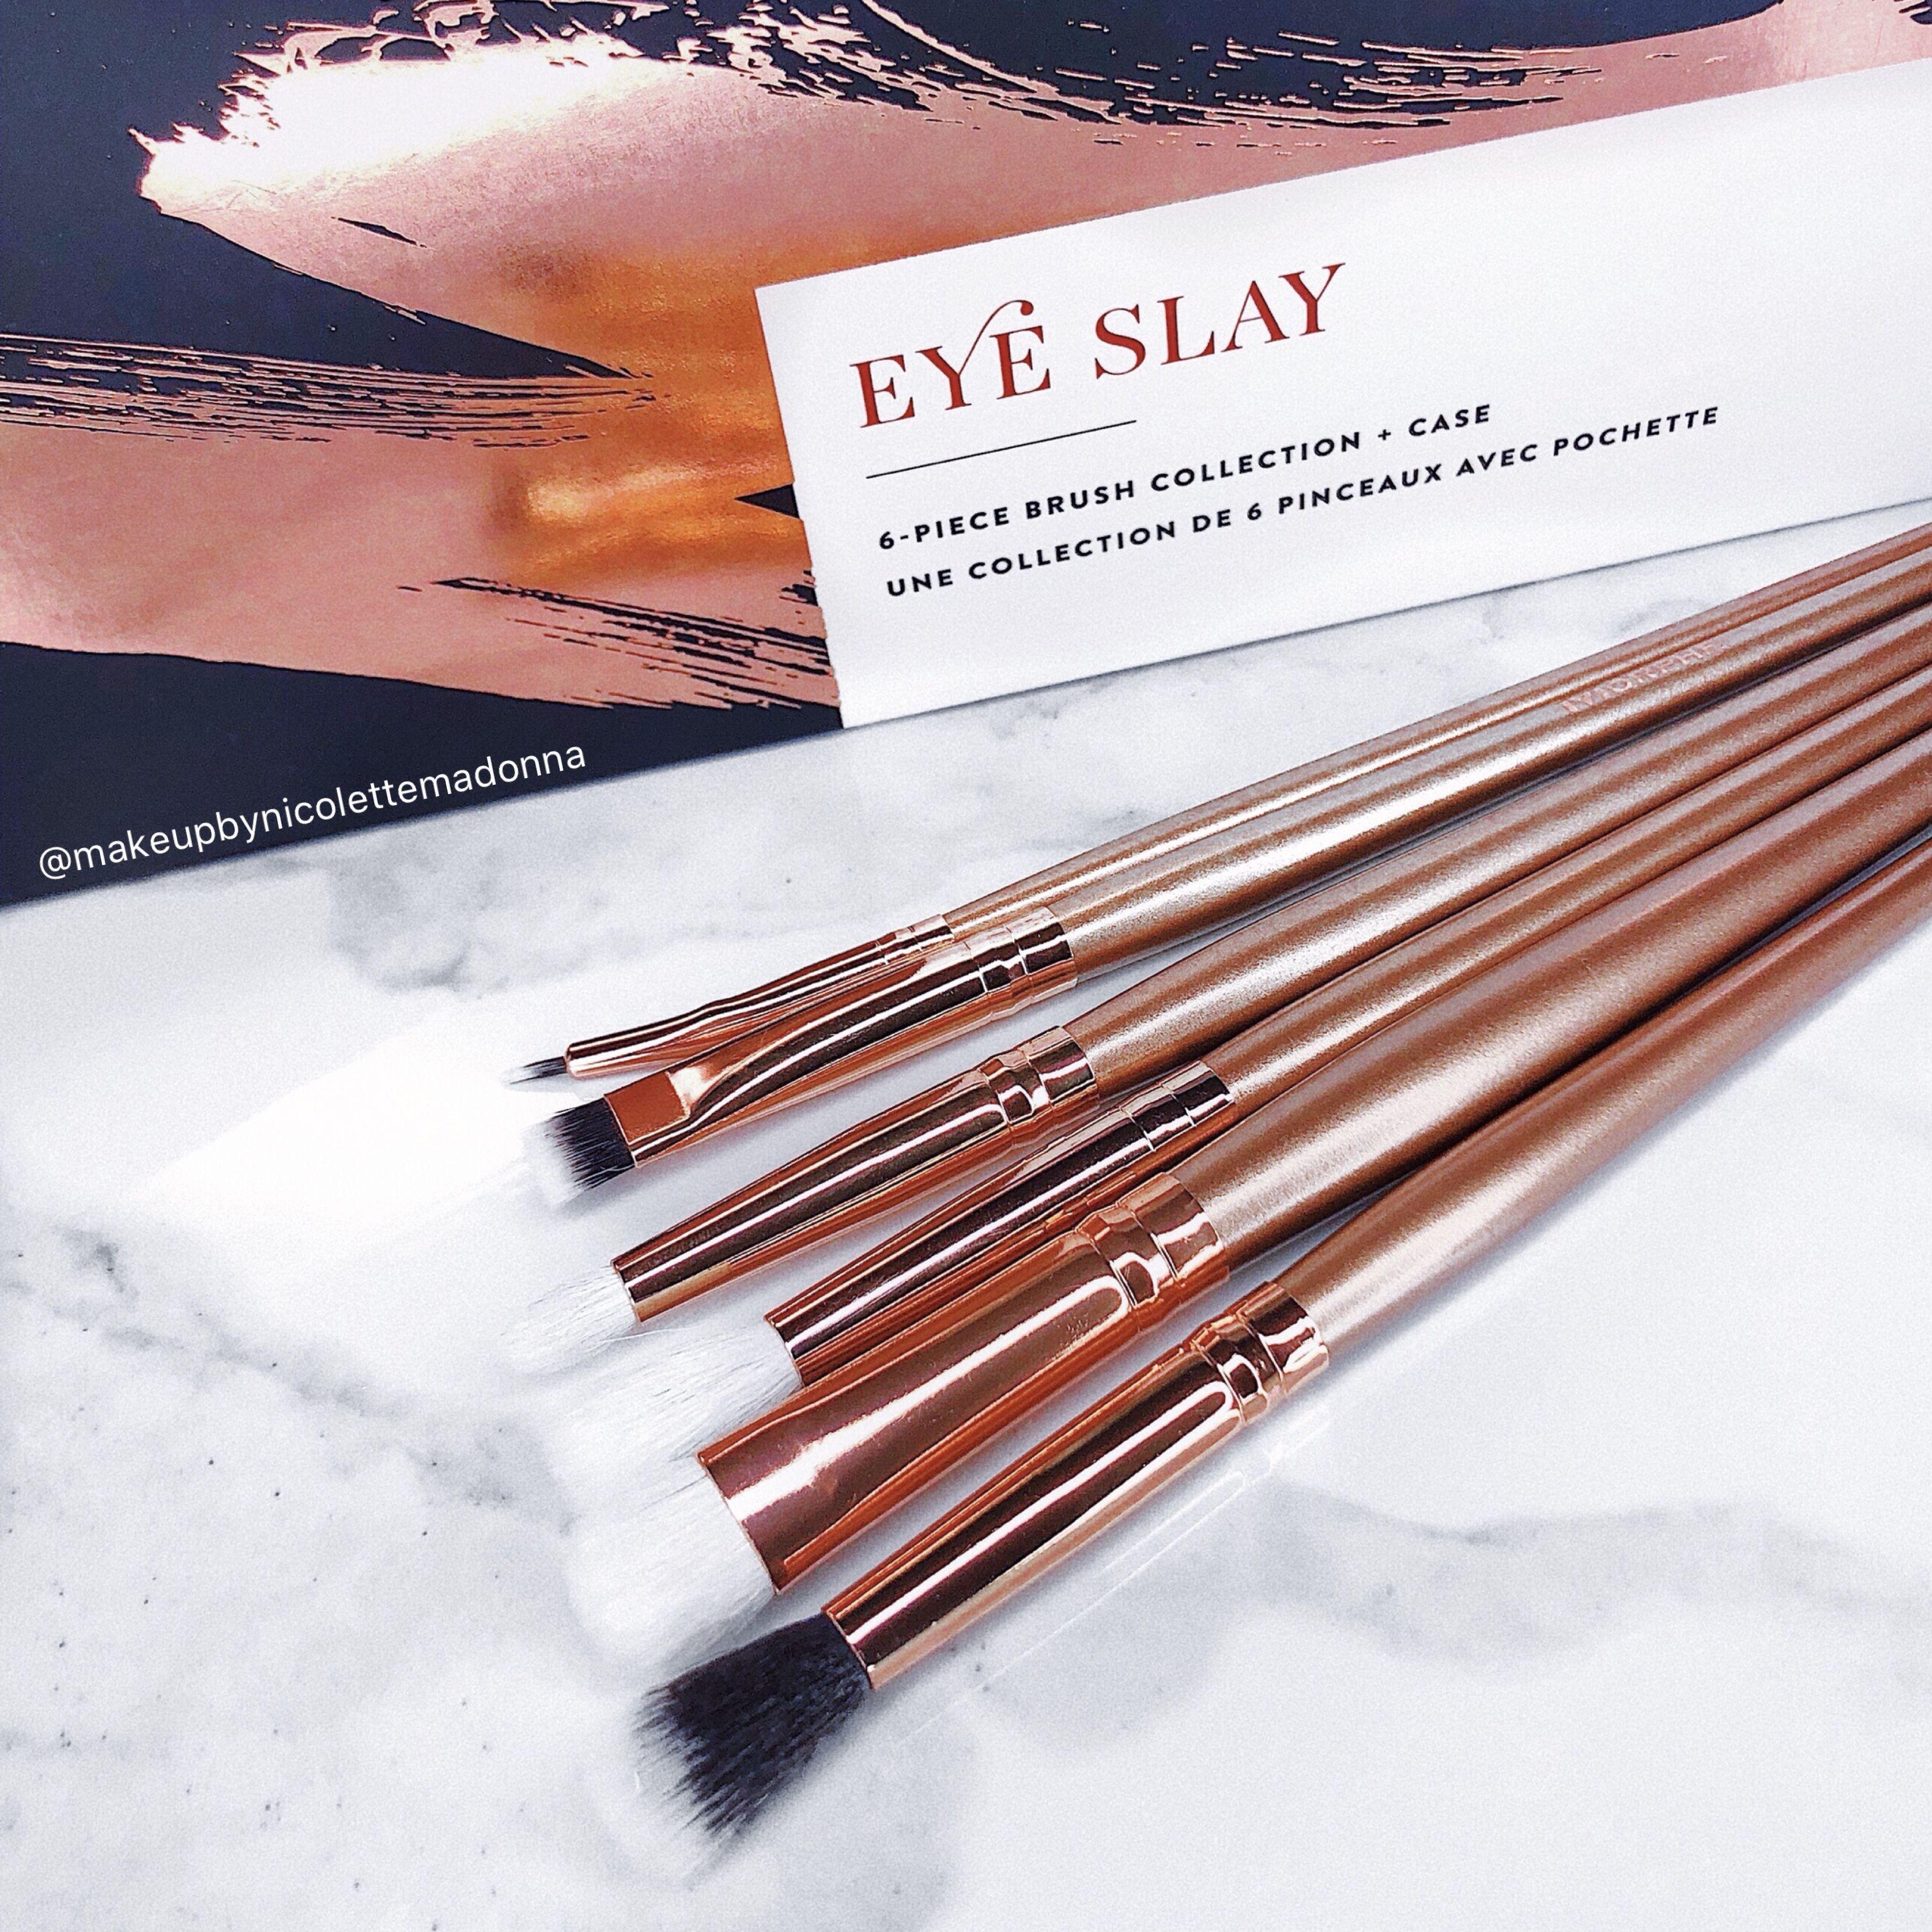 Morphe Eye Slay brush set! How to clean makeup brushes